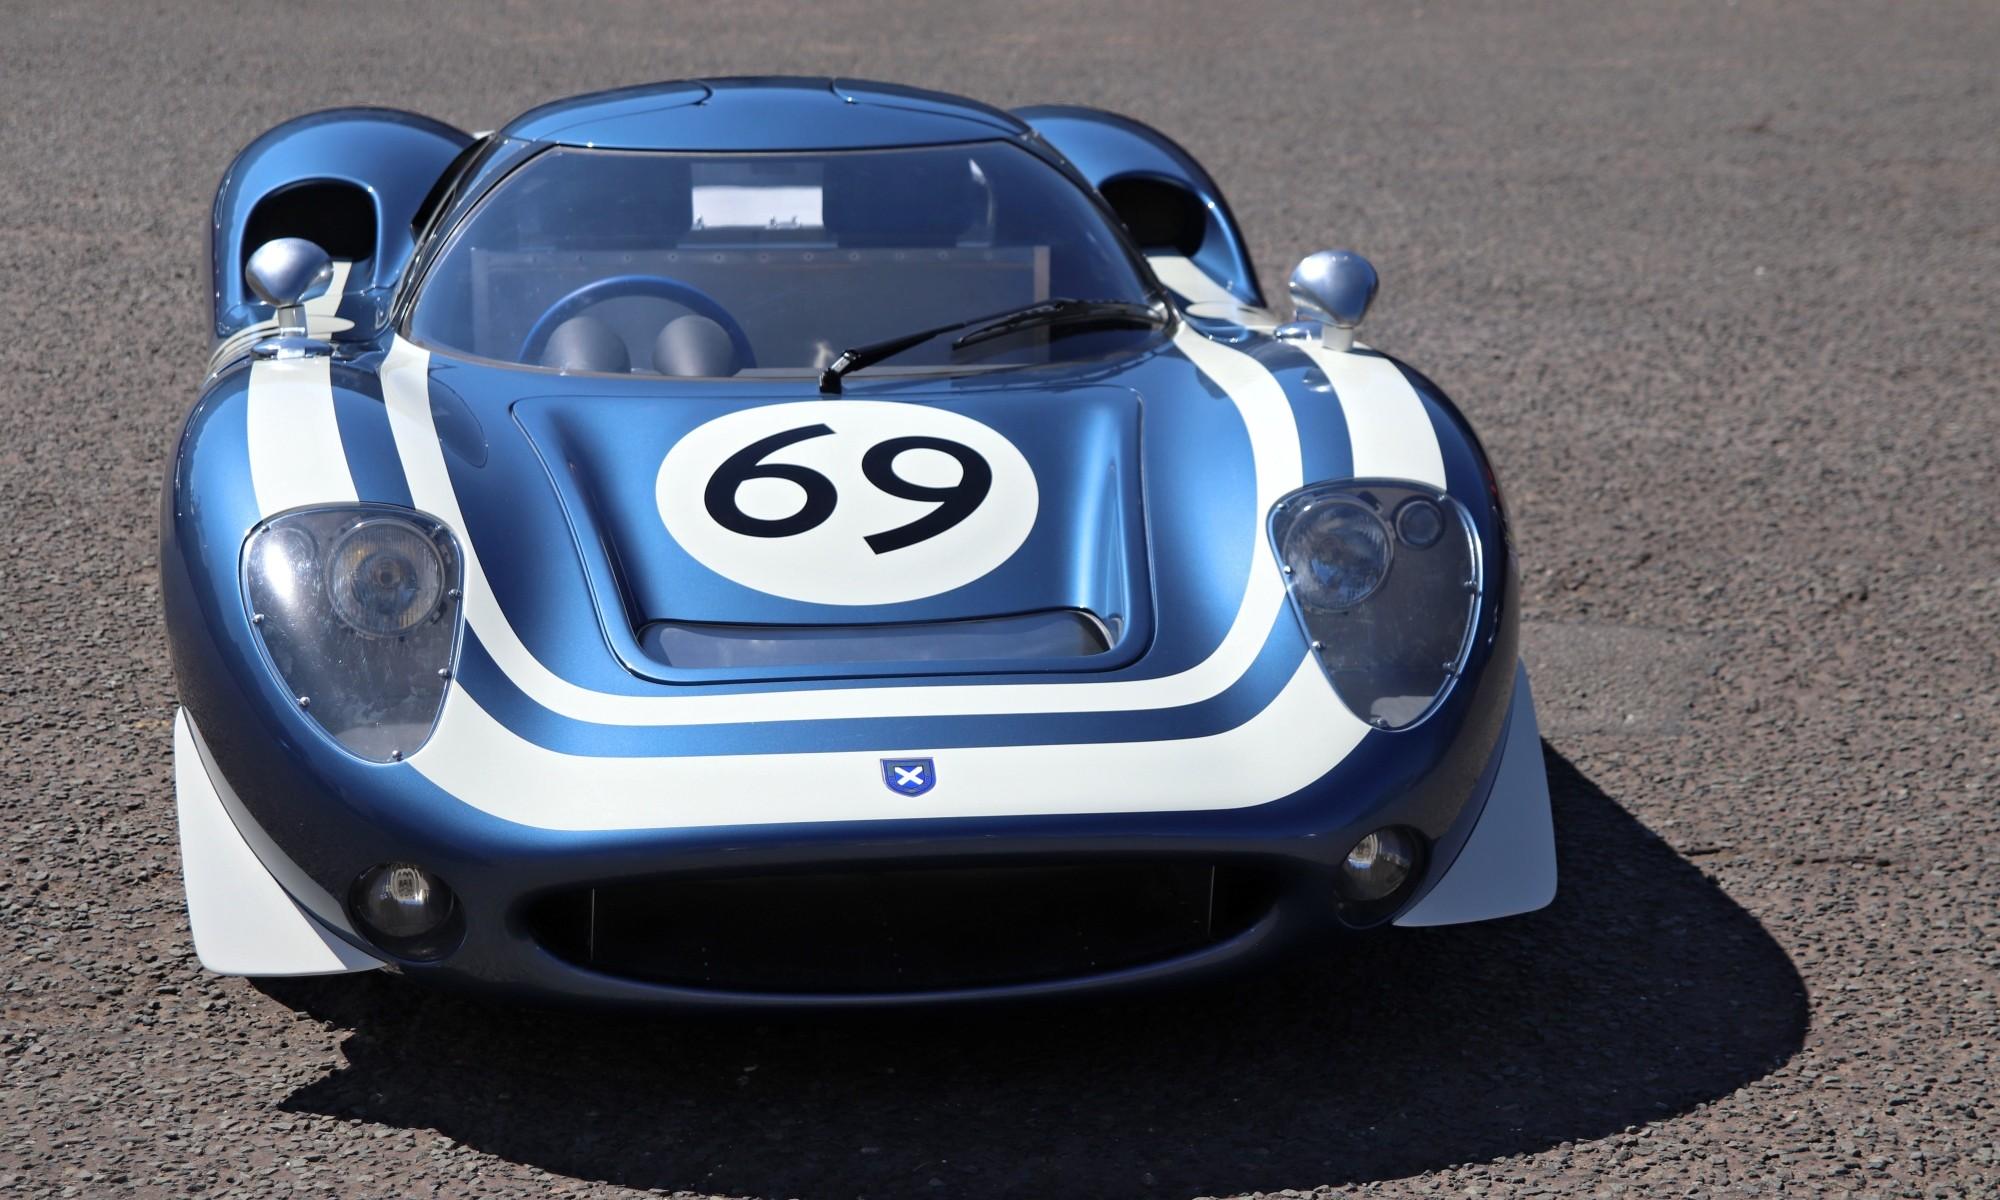 Ecurie Ecosse LM69 front